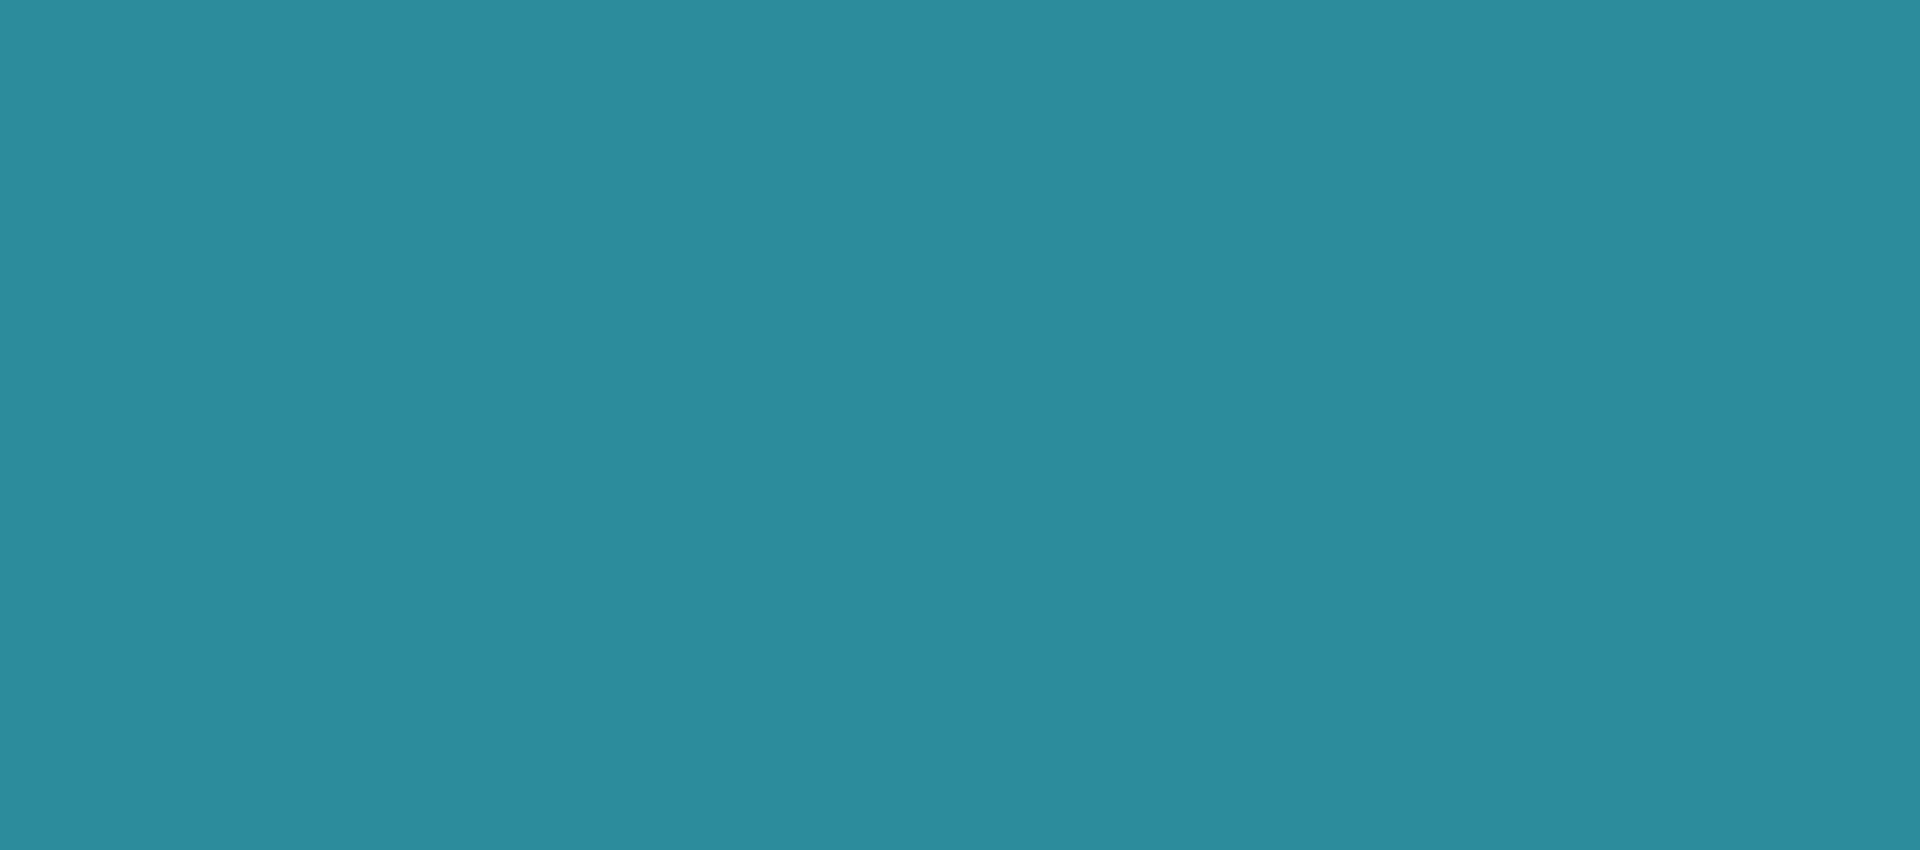 toilettage chien lyon, toilettage pour chien, toiletteur chat lyon, salon de toilettage, salon toilettage, toiletteur lyon, chien lyon, produit pour chien lyon, prix toilettage chien, toiletteur canin lyon, toiletteur canin villeurbanne, toilettage chien à domicile, toilettage chat lyon, audreco, formation toilettage,